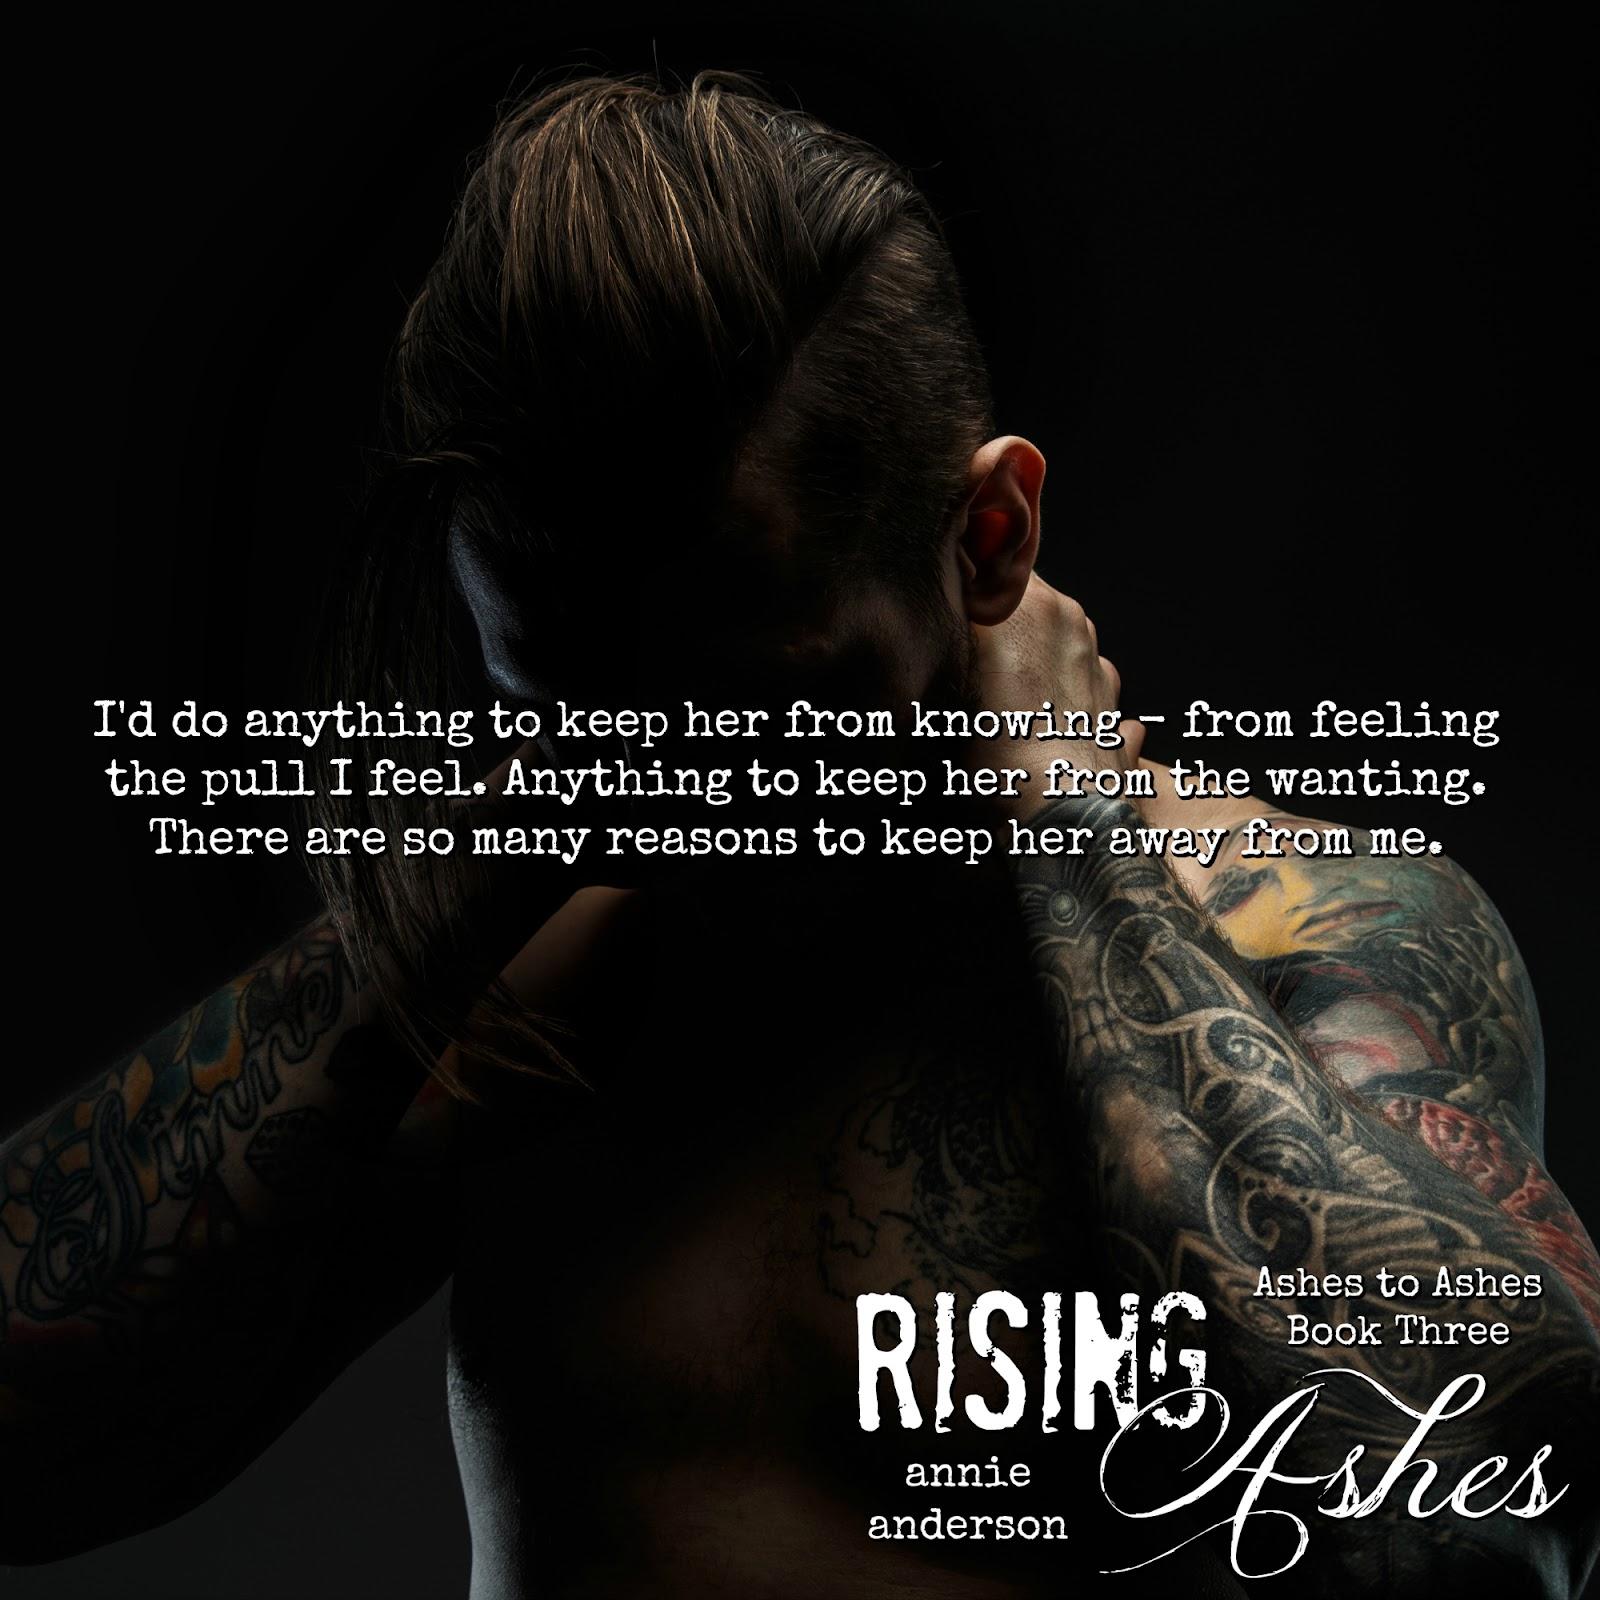 Rising Ashes - Wanting Teaser.jpg